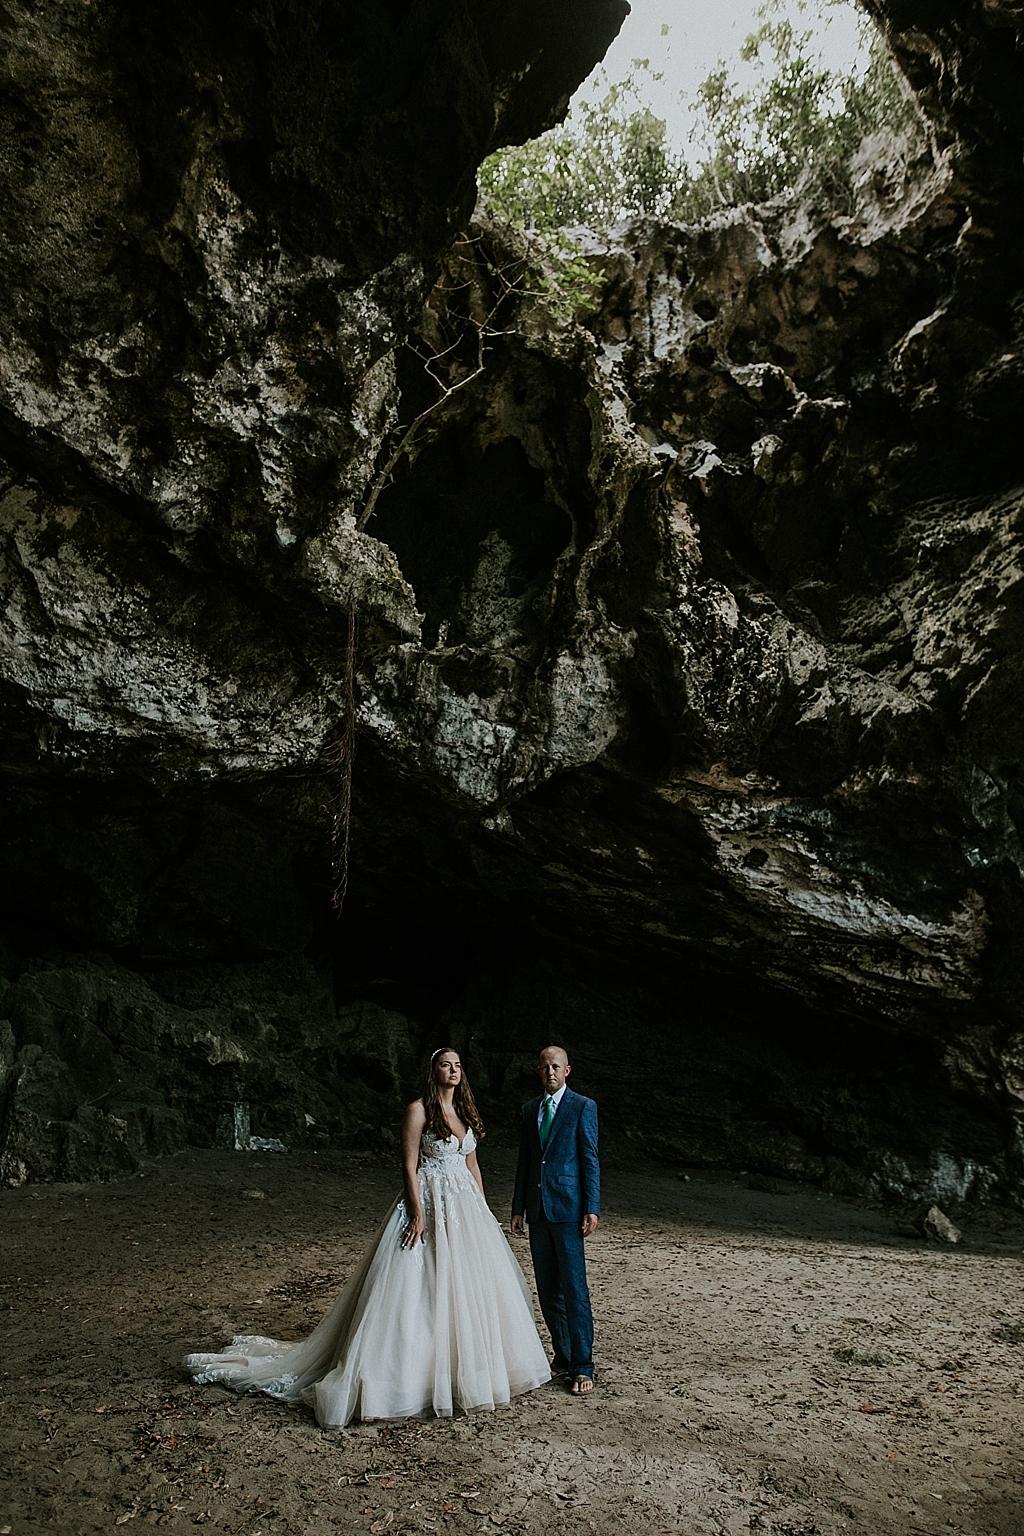 Eluethera bahamas elopement